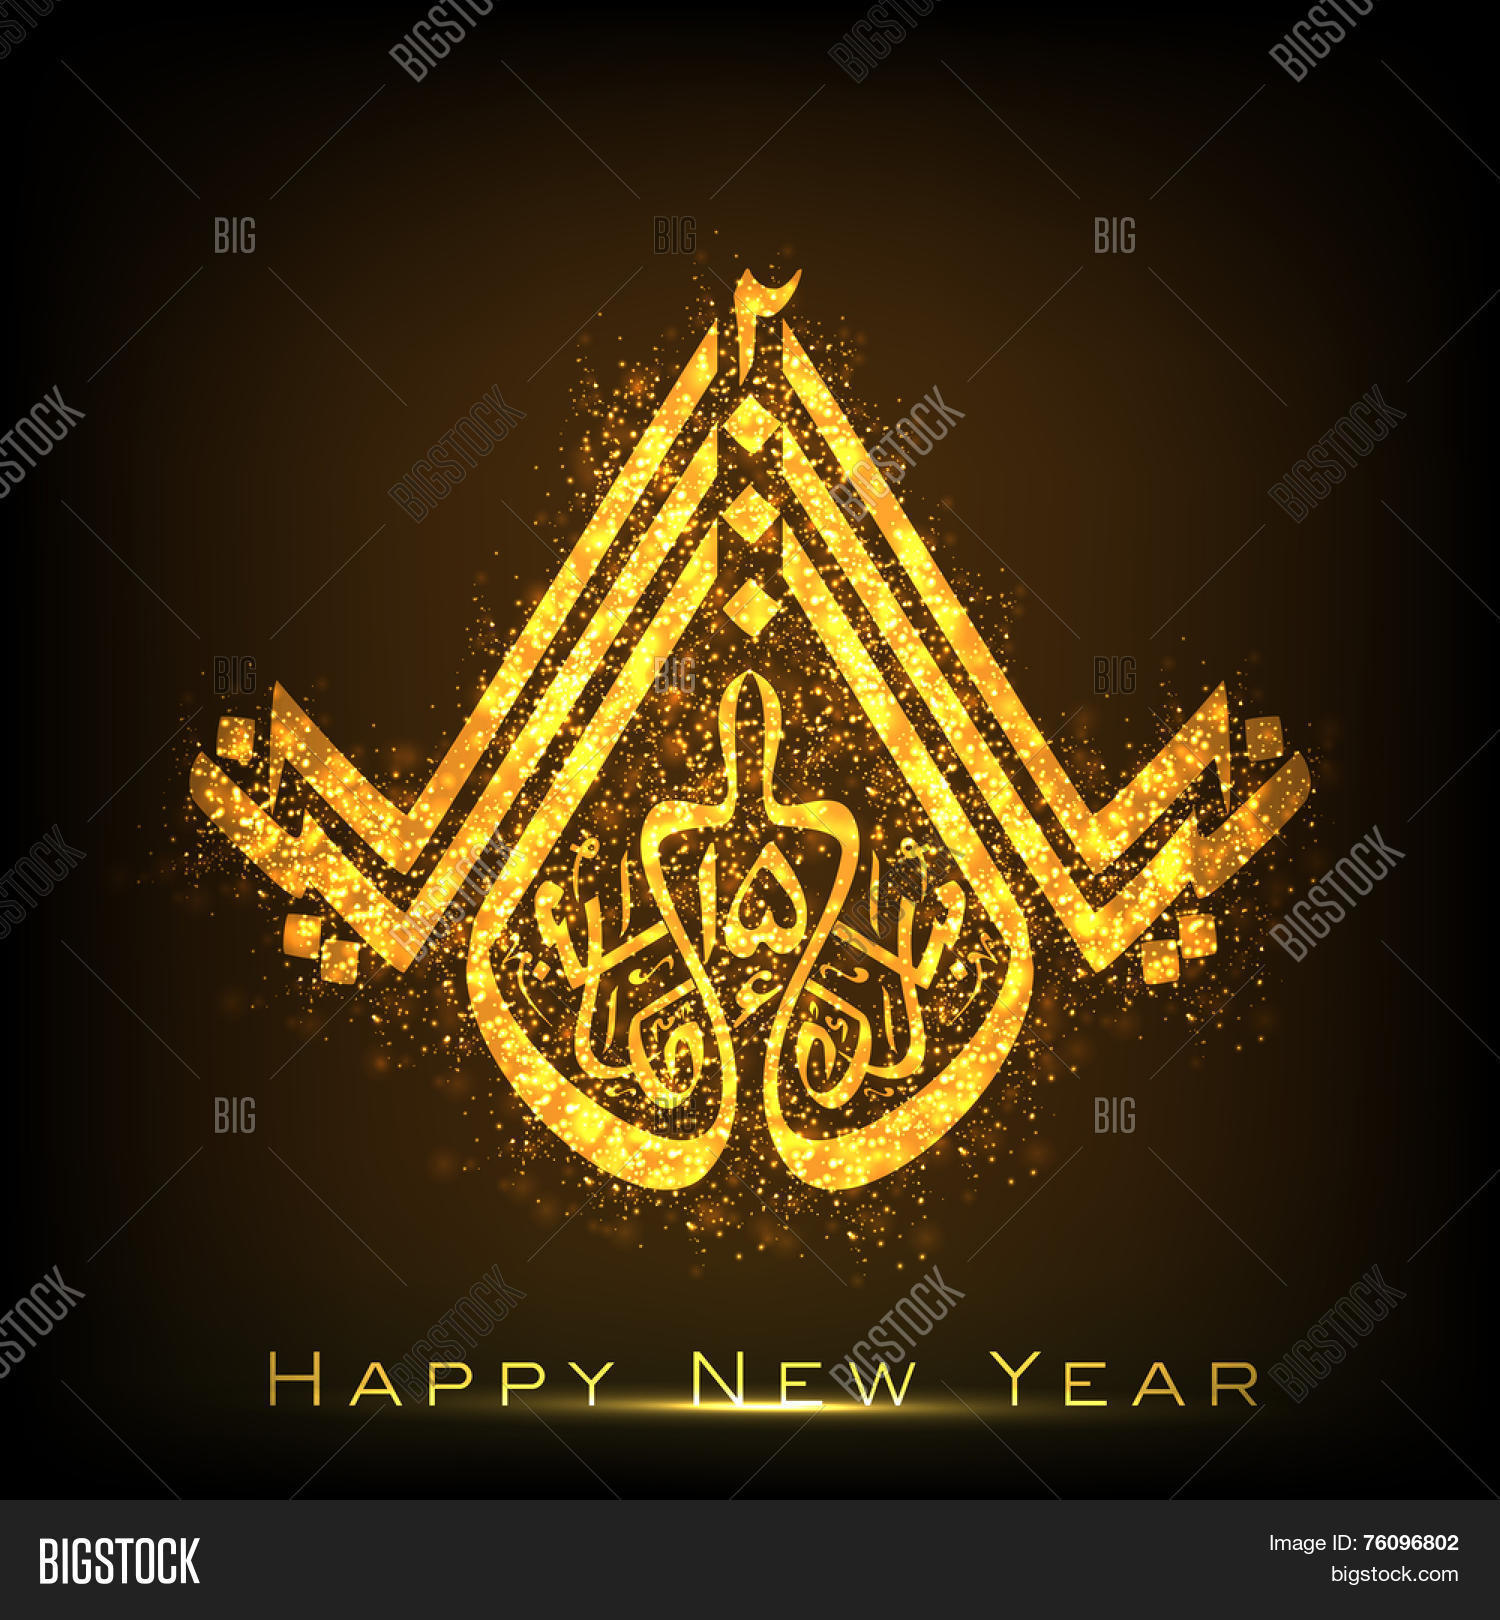 Beautiful greeting card design vector photo bigstock beautiful greeting card design with shiny golden urdu islamic calligraphy of text naya saal mubarak 2015 kristyandbryce Gallery